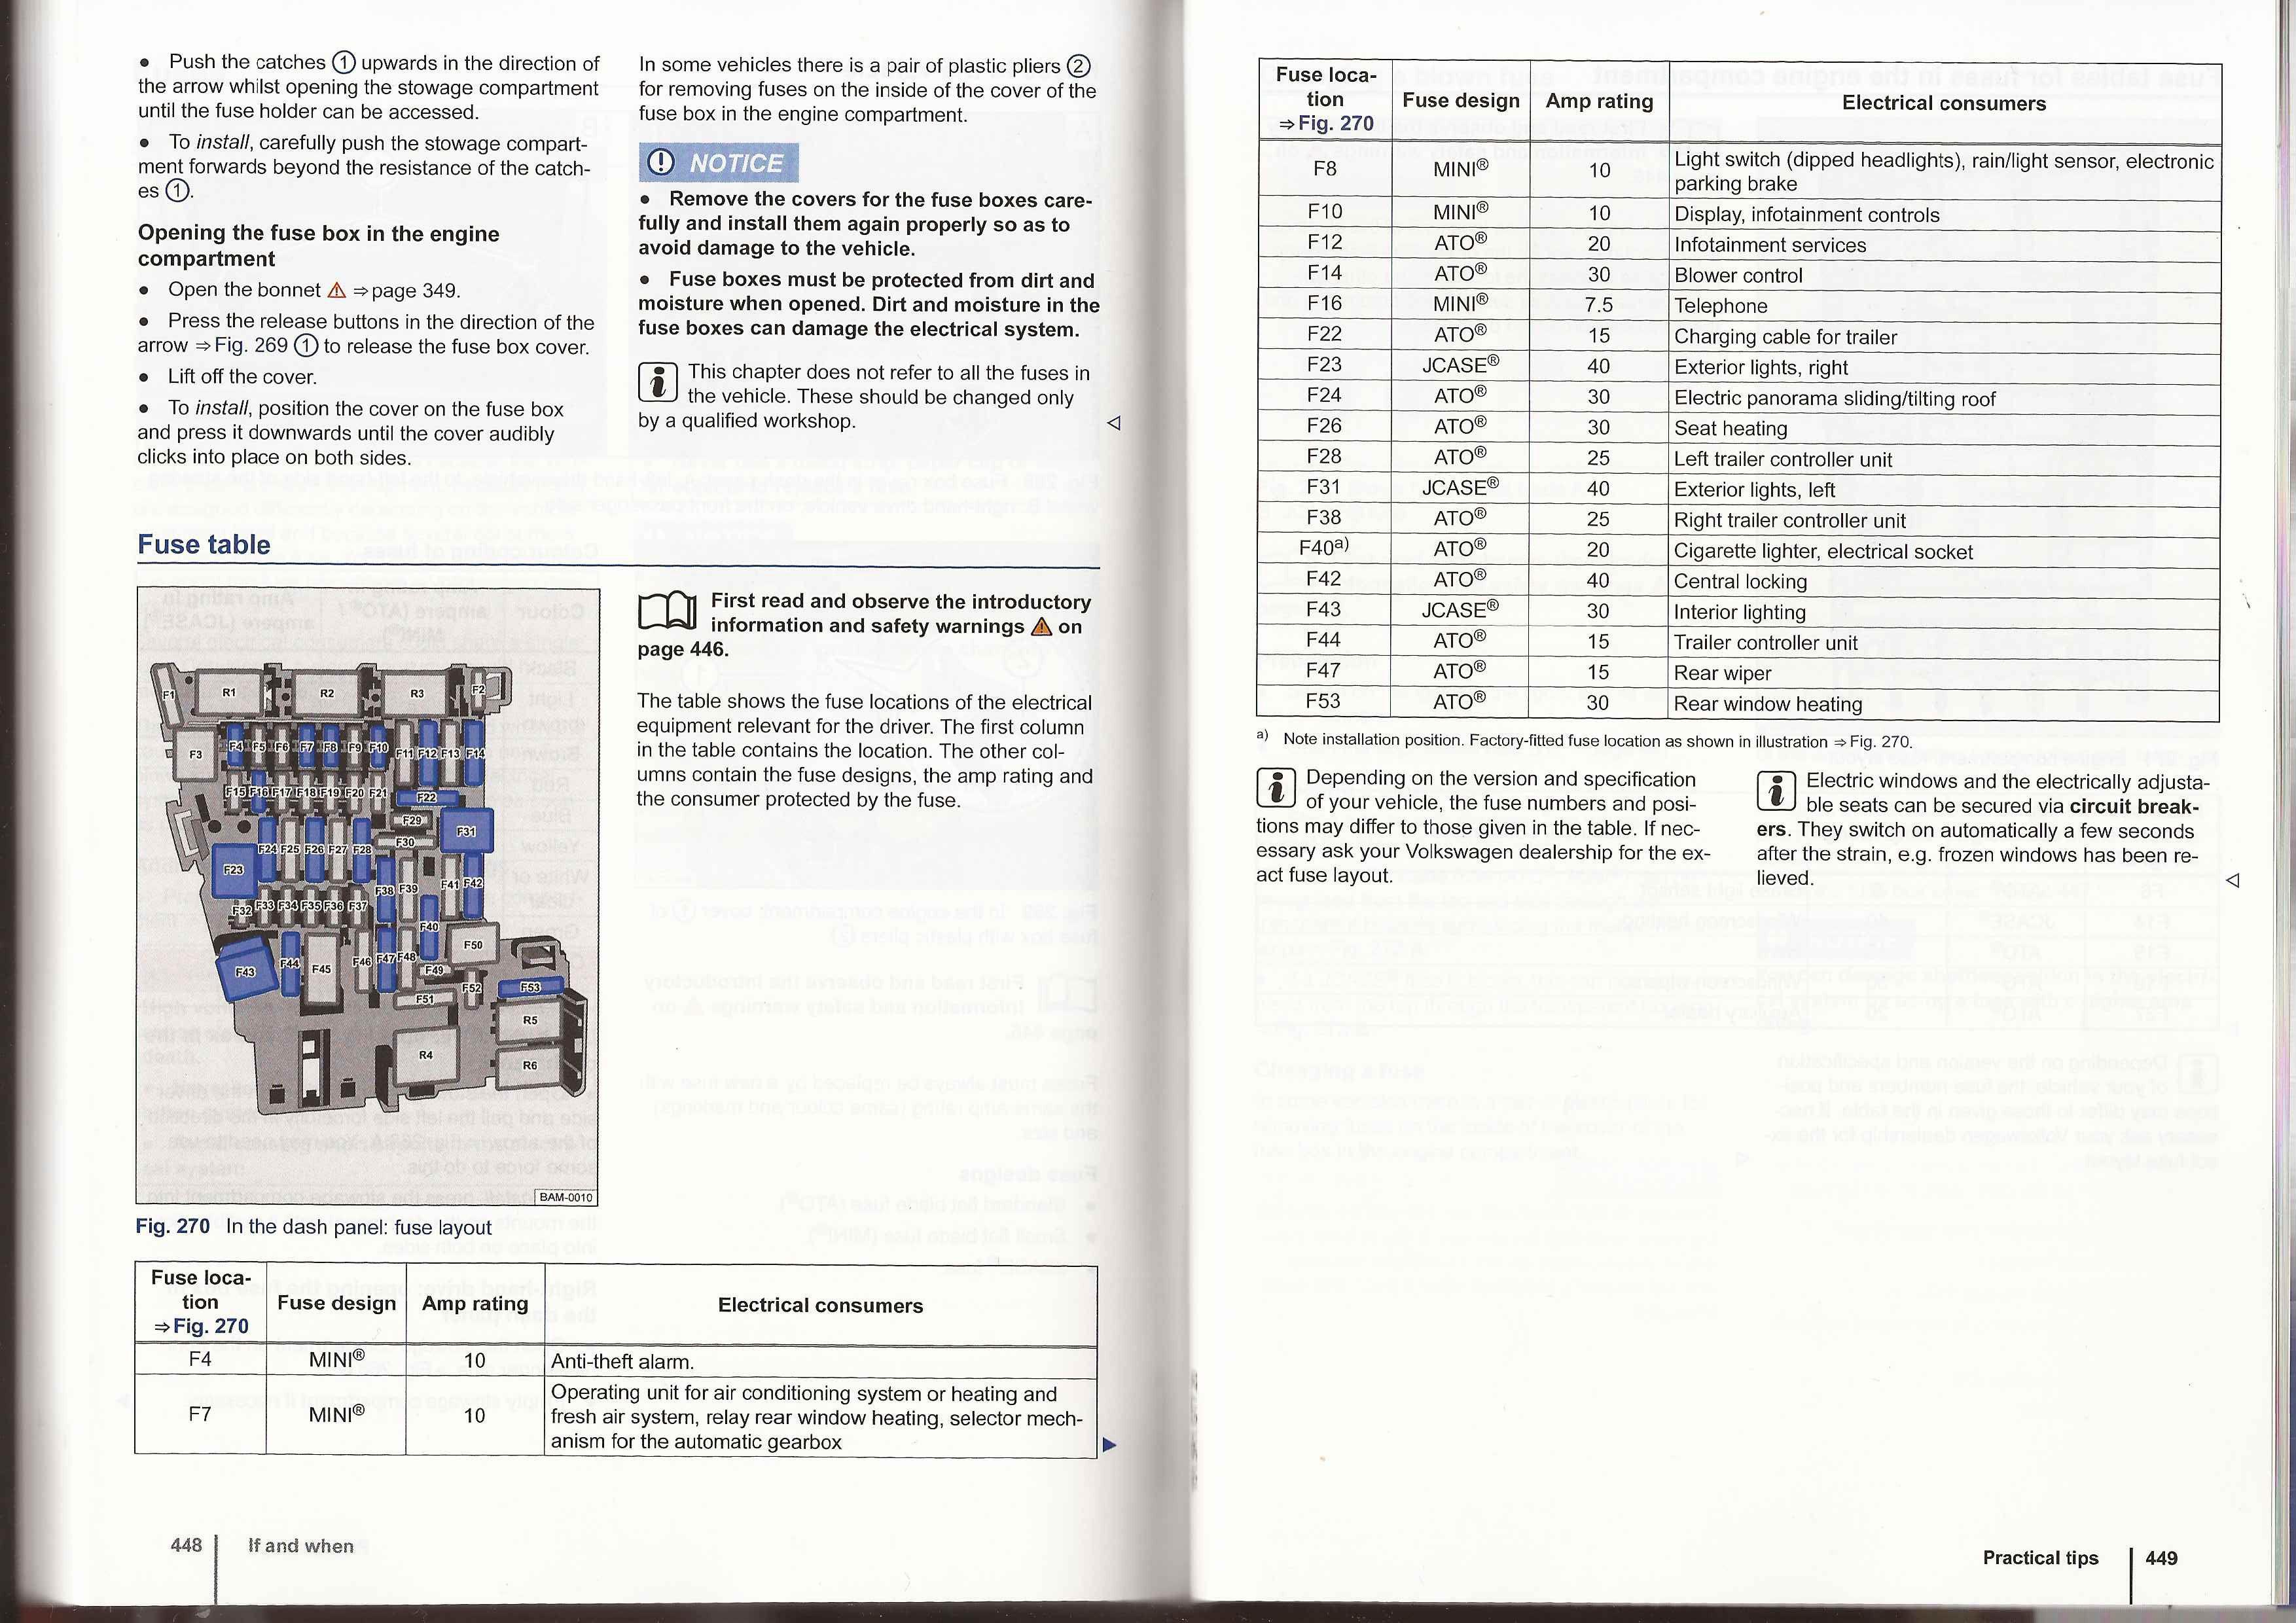 Surprising Audi Fuse Box Map Wiring Library Wiring Cloud Dulfrecoveryedborg